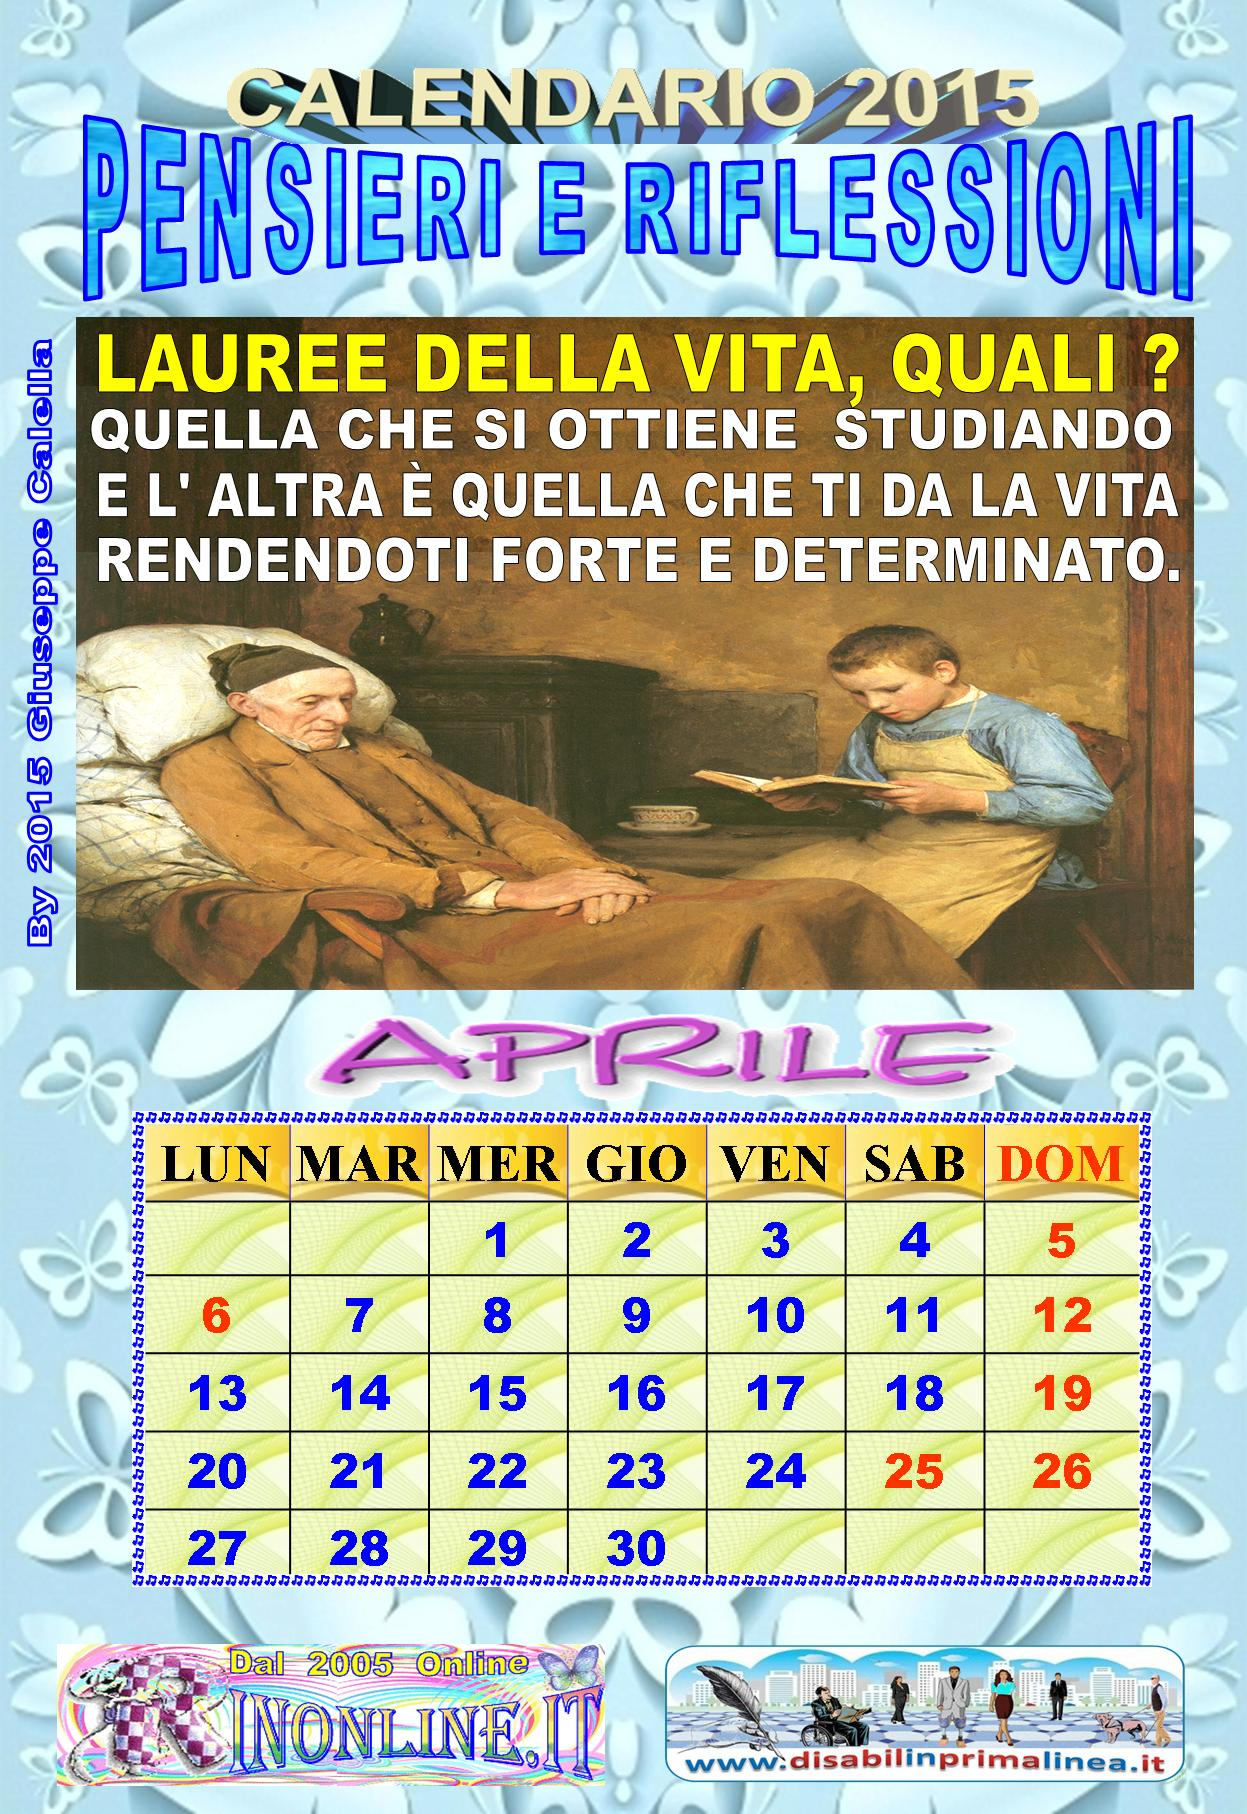 aprile_calendario_2015_pensieri_riflessioni_giuseppe_calella